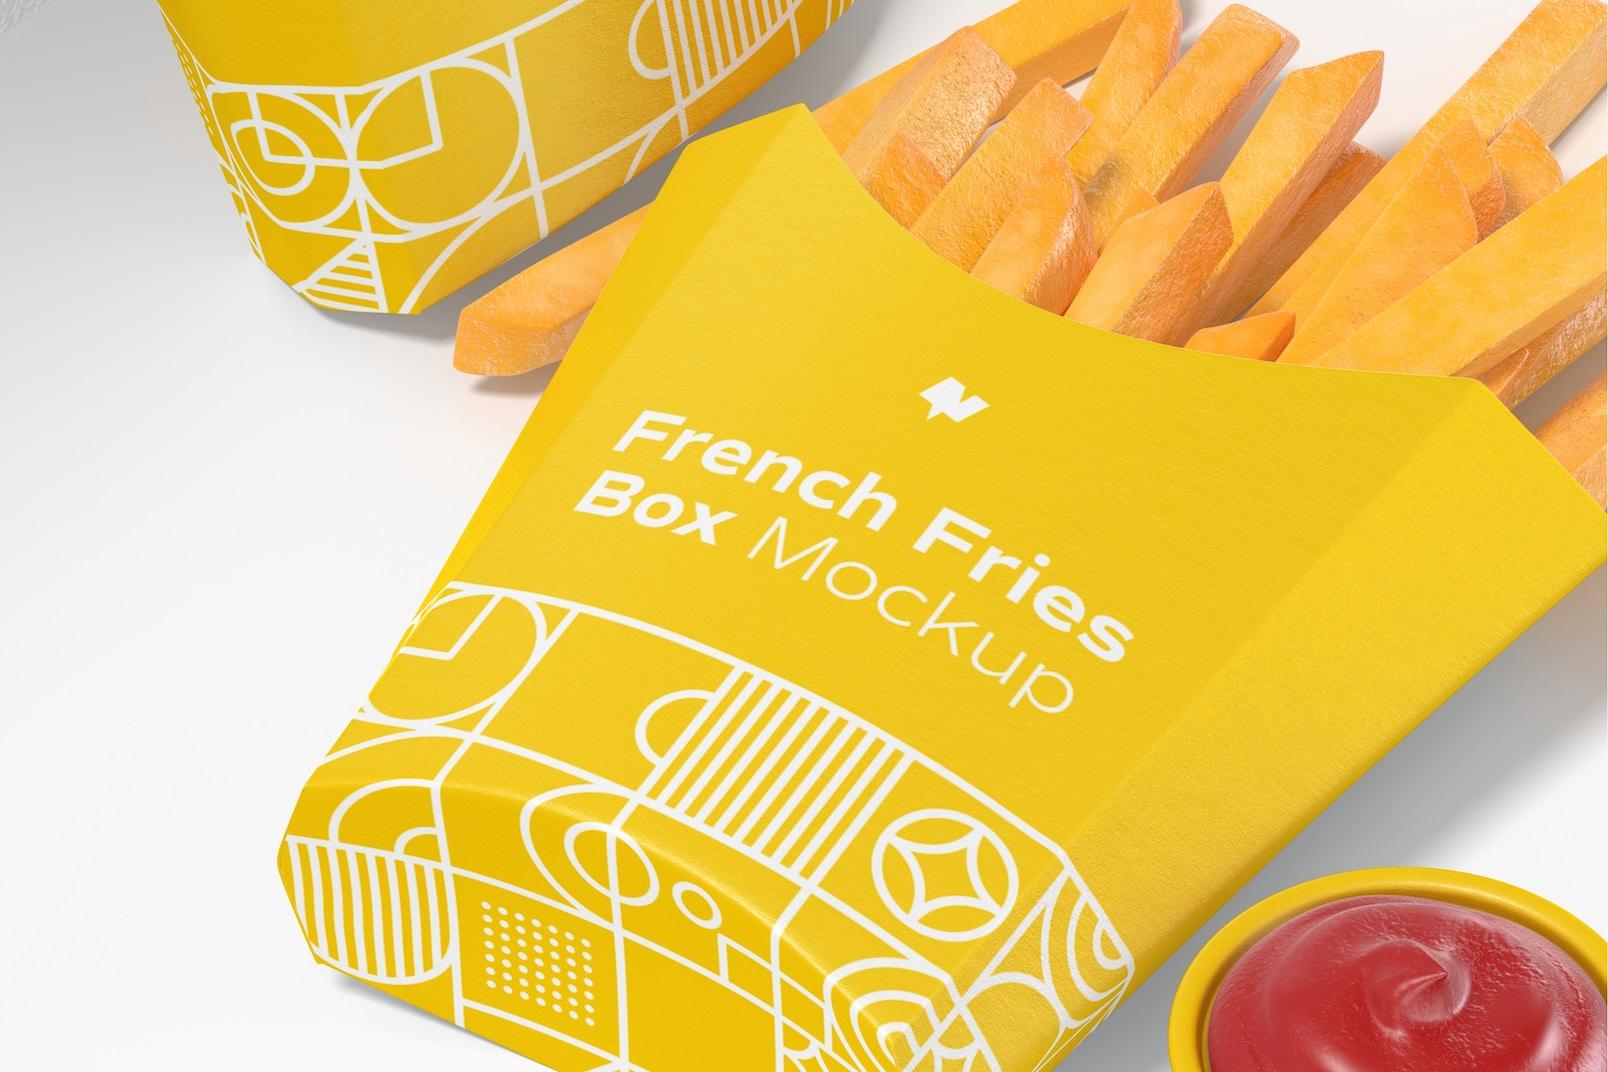 French Fries Box Mockup, Dropped